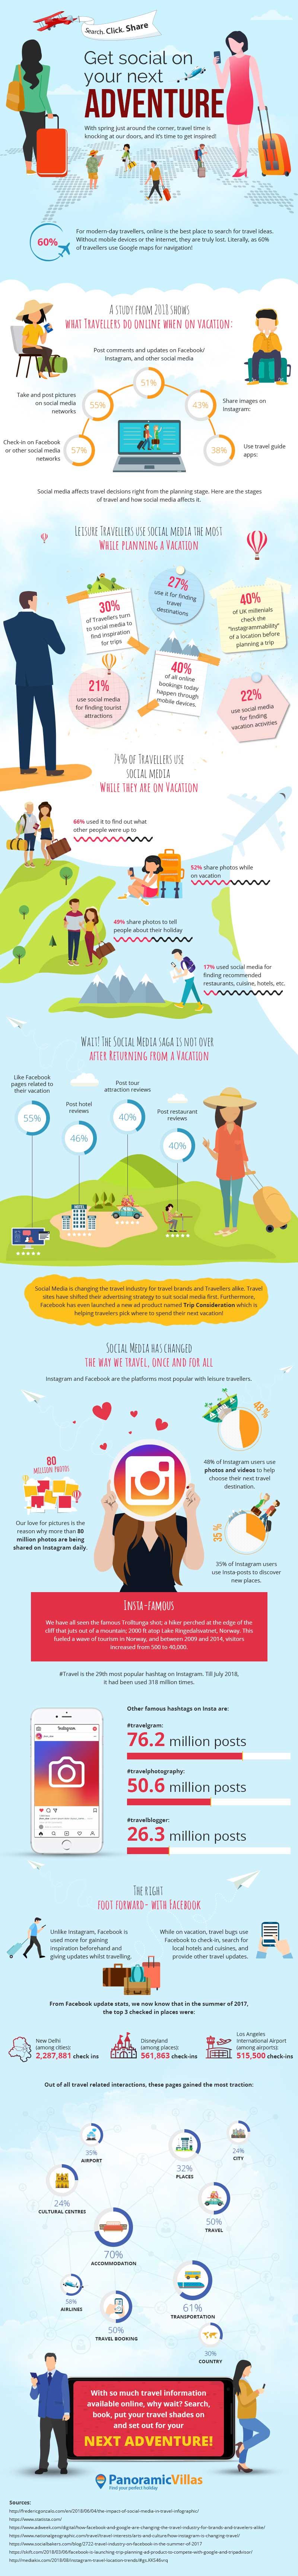 social media travel infographic